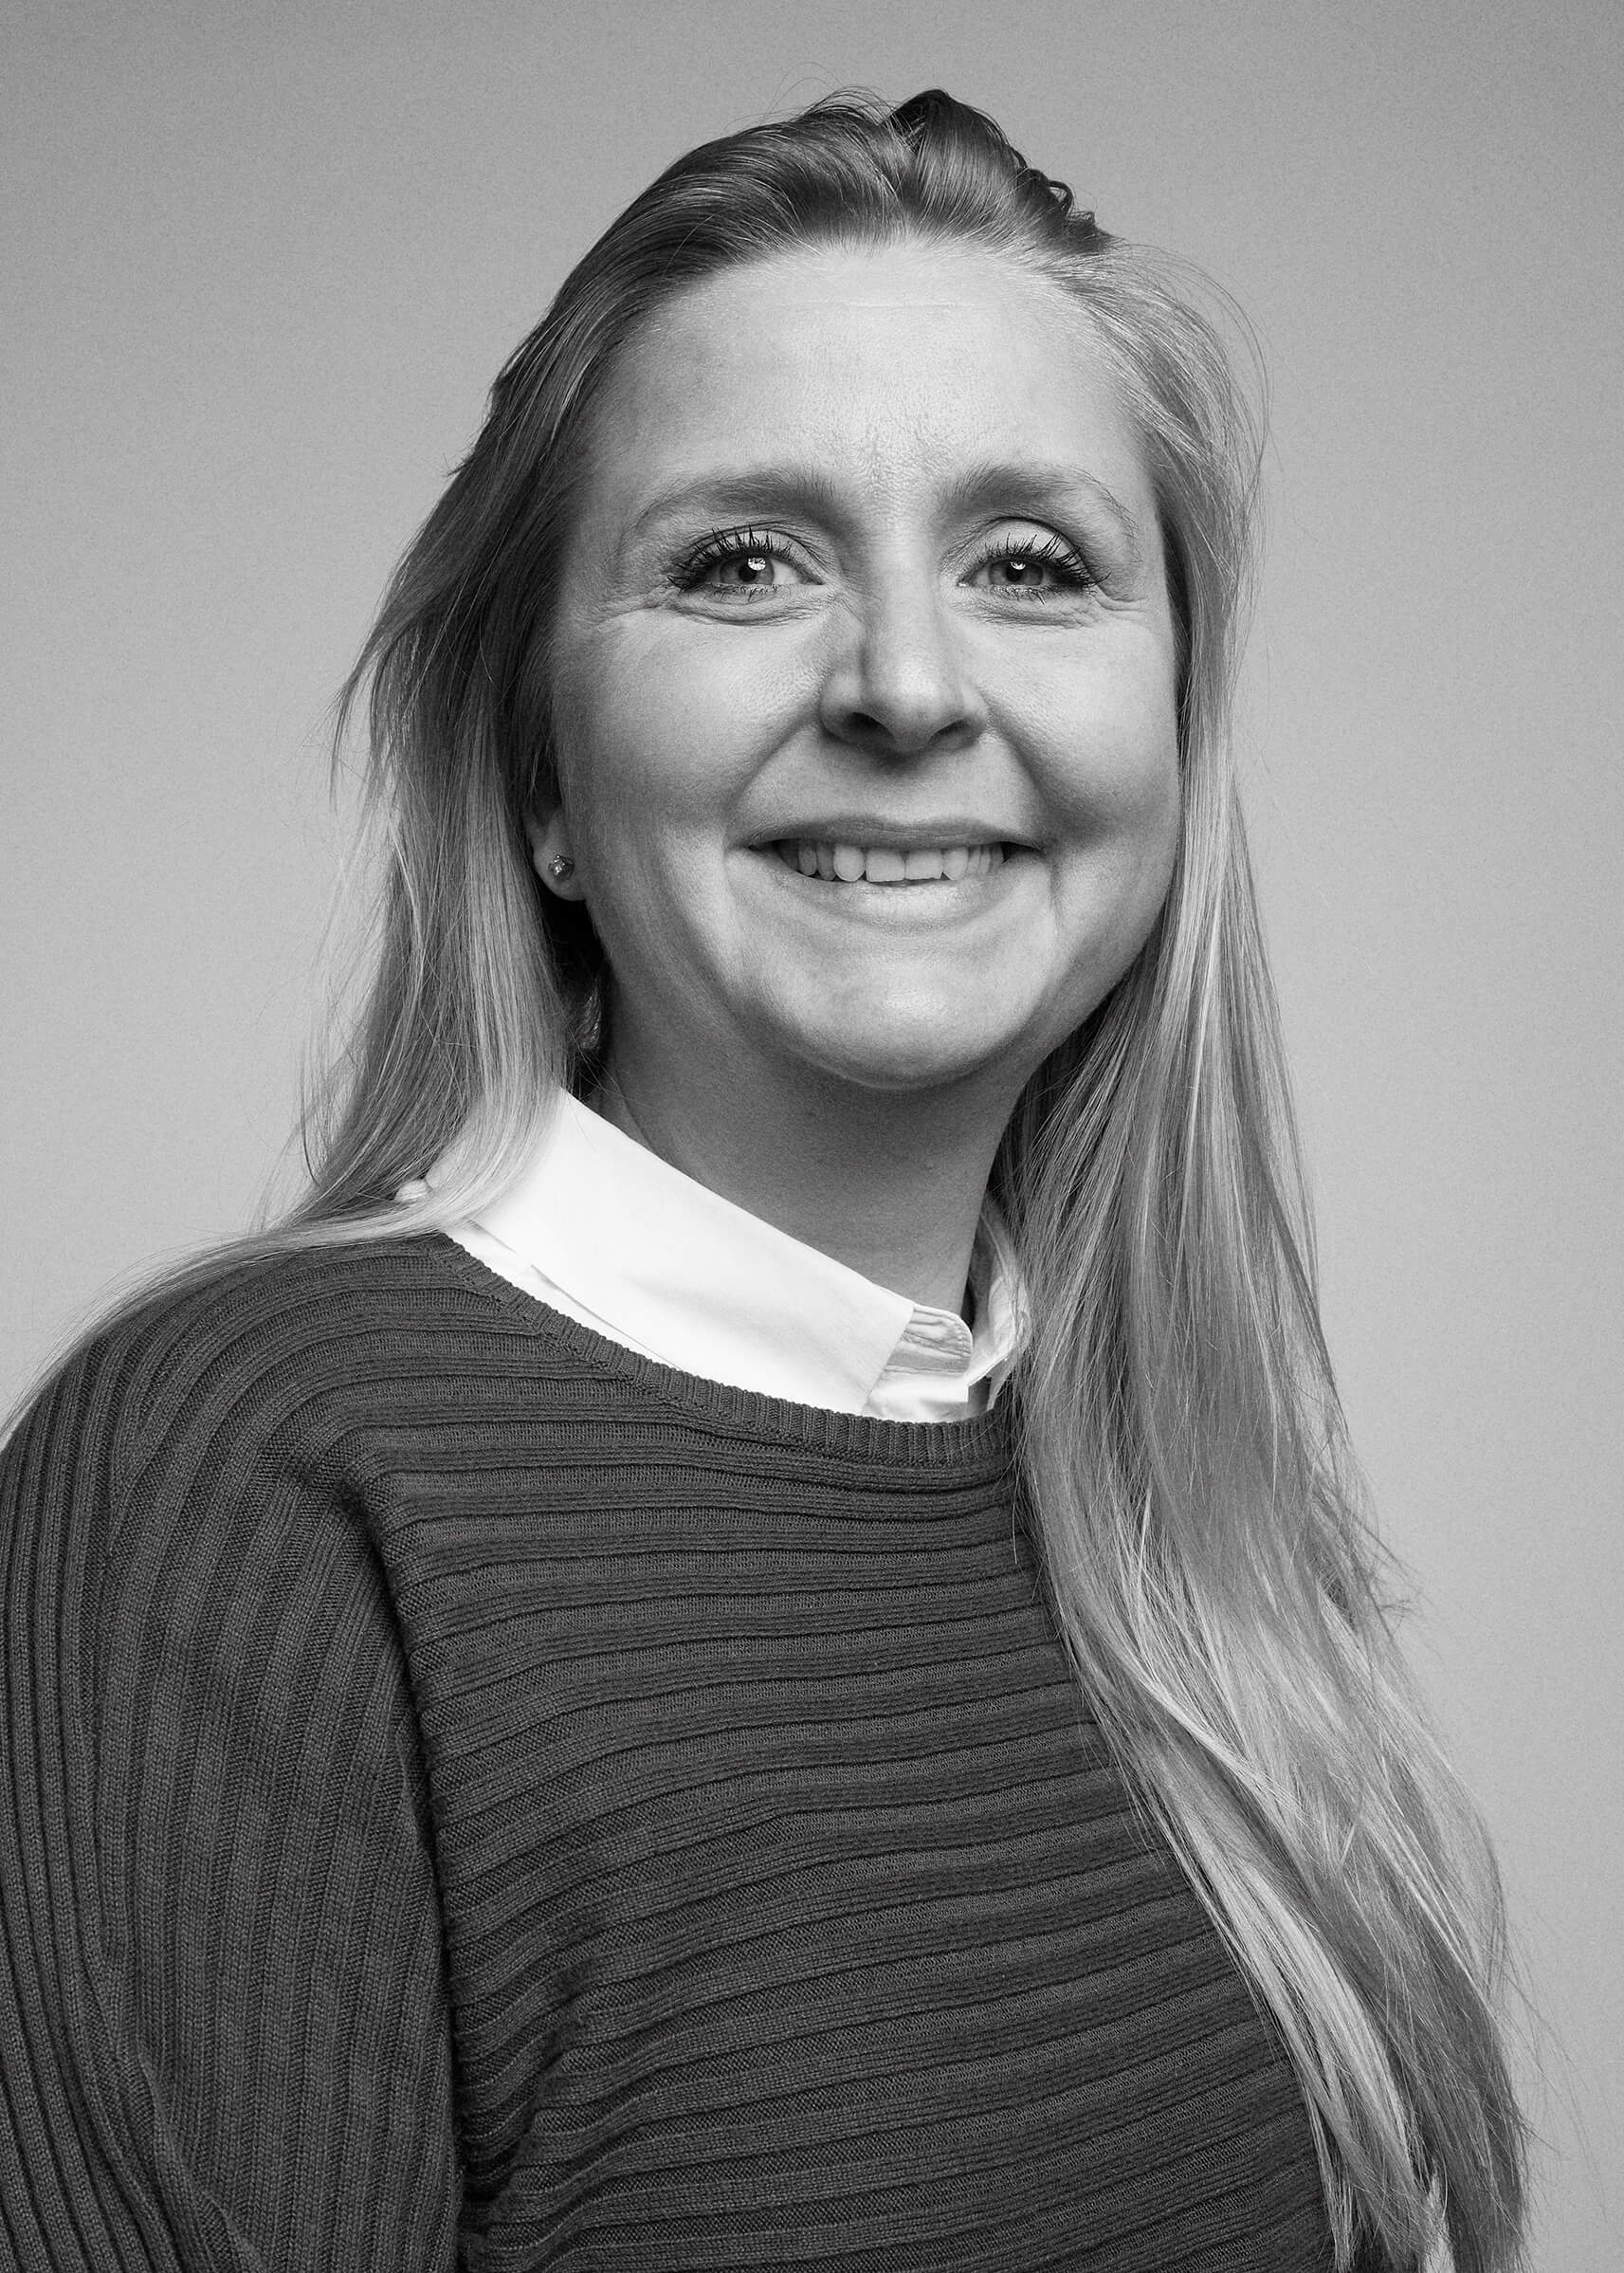 Johanna Eskilsson